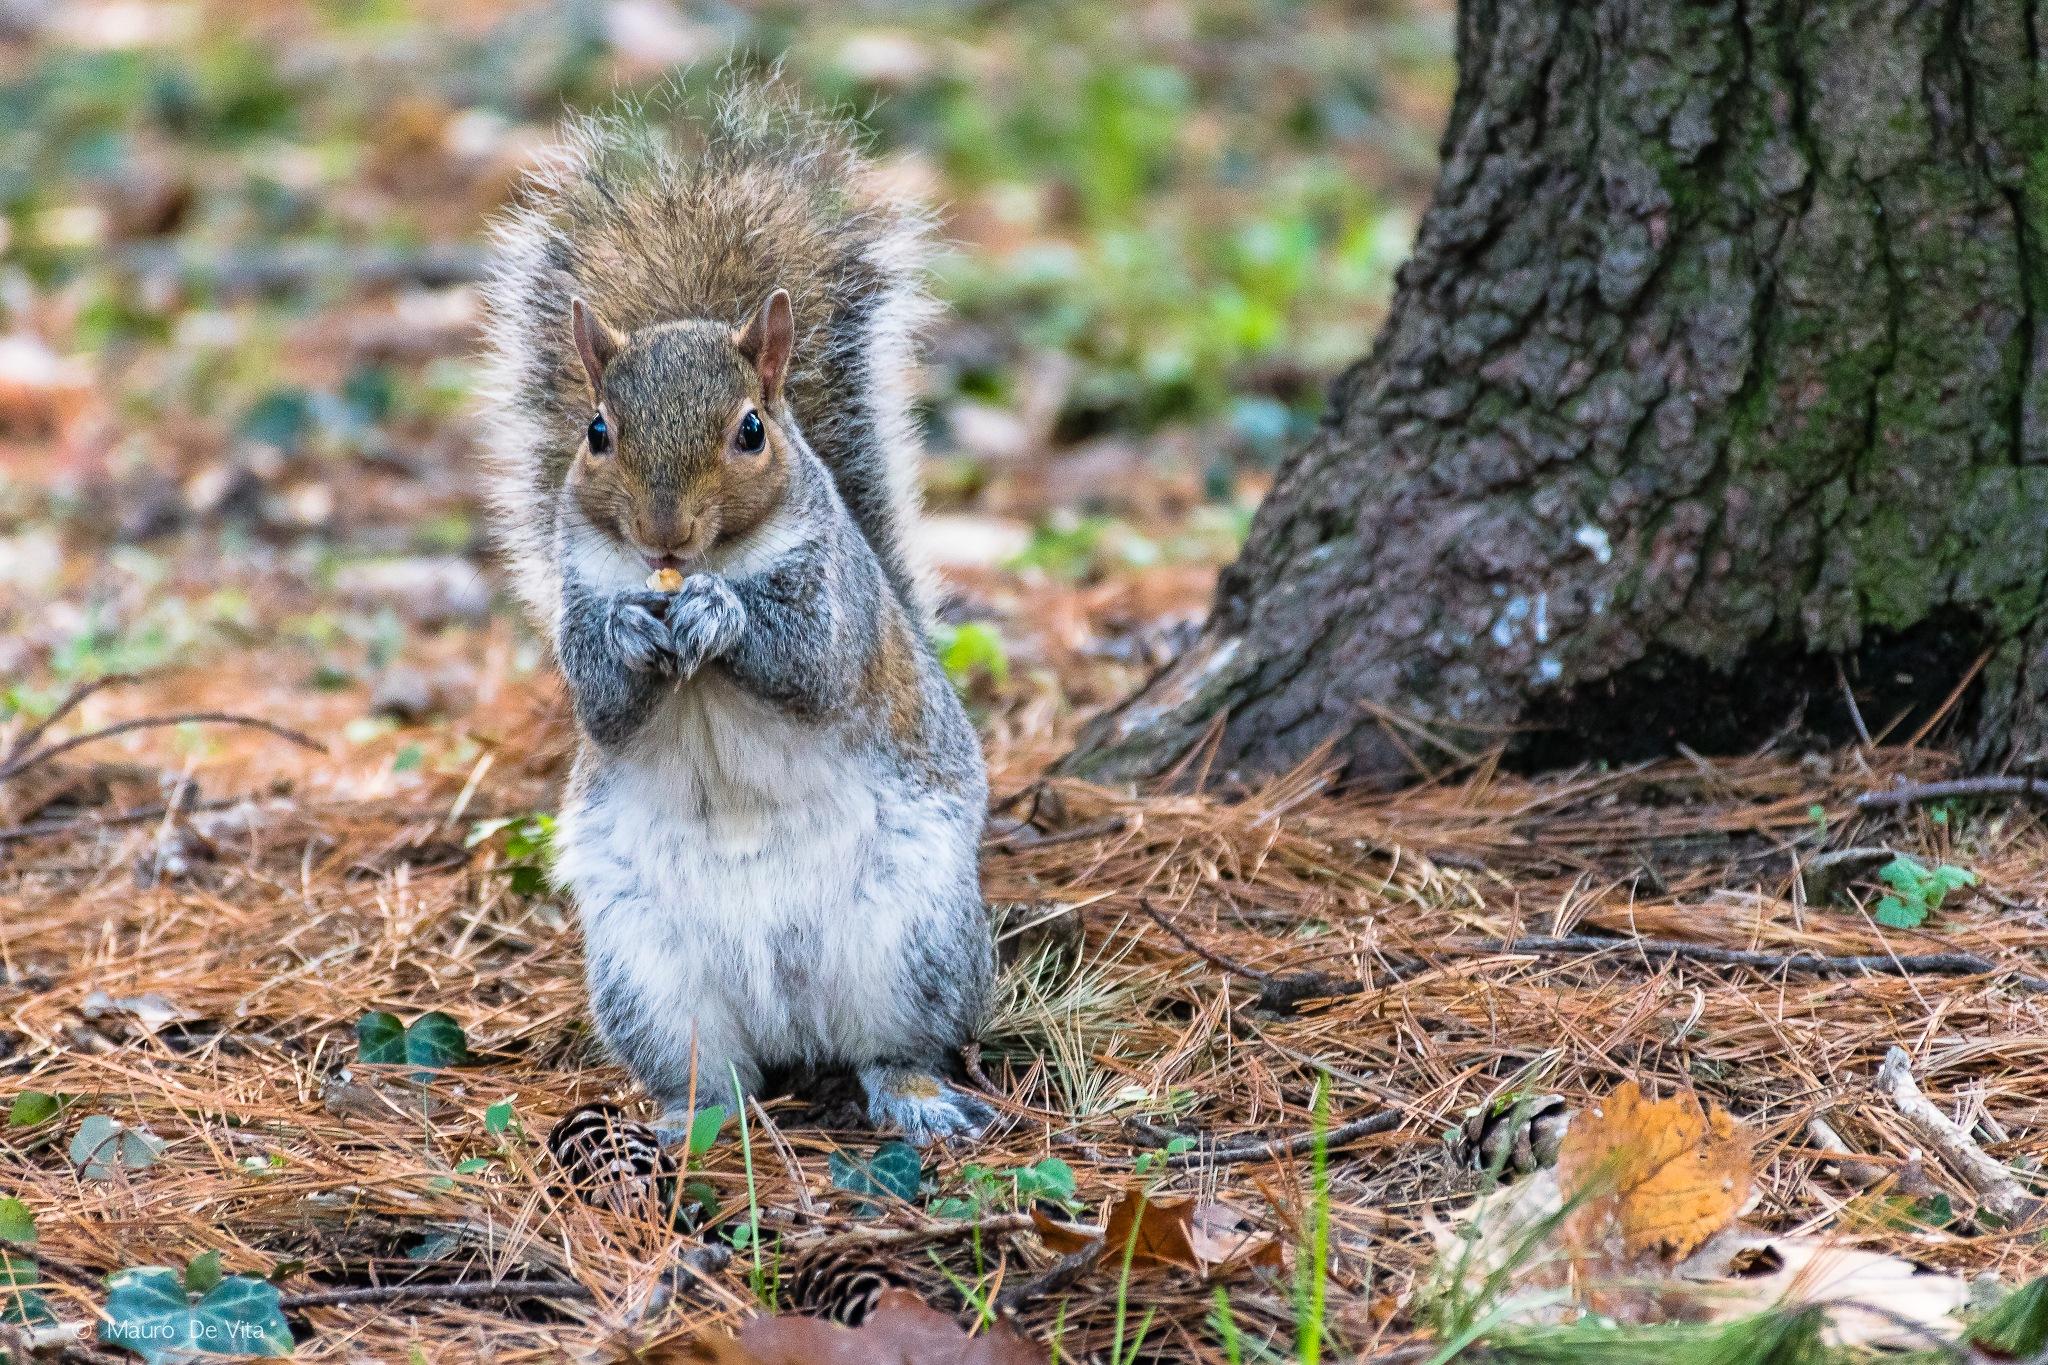 Squirrel by Mauro De Vita